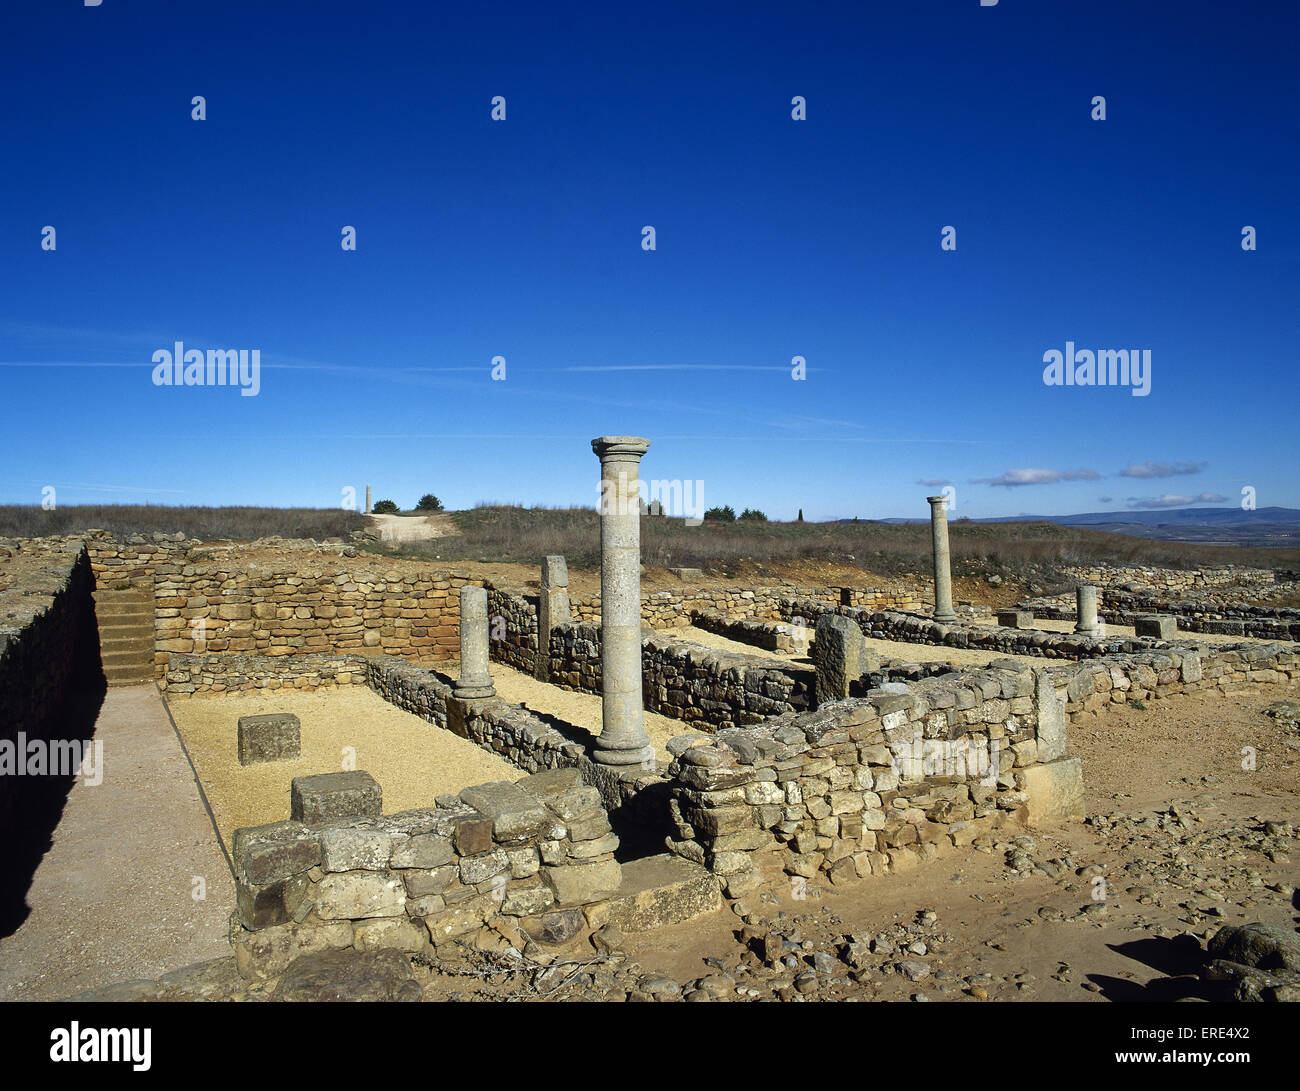 Numancia. Ancient Celtiberian settlement. Famous in the Celtiberian Wars. Roman ruins. Near Soria. Spain. - Stock Image